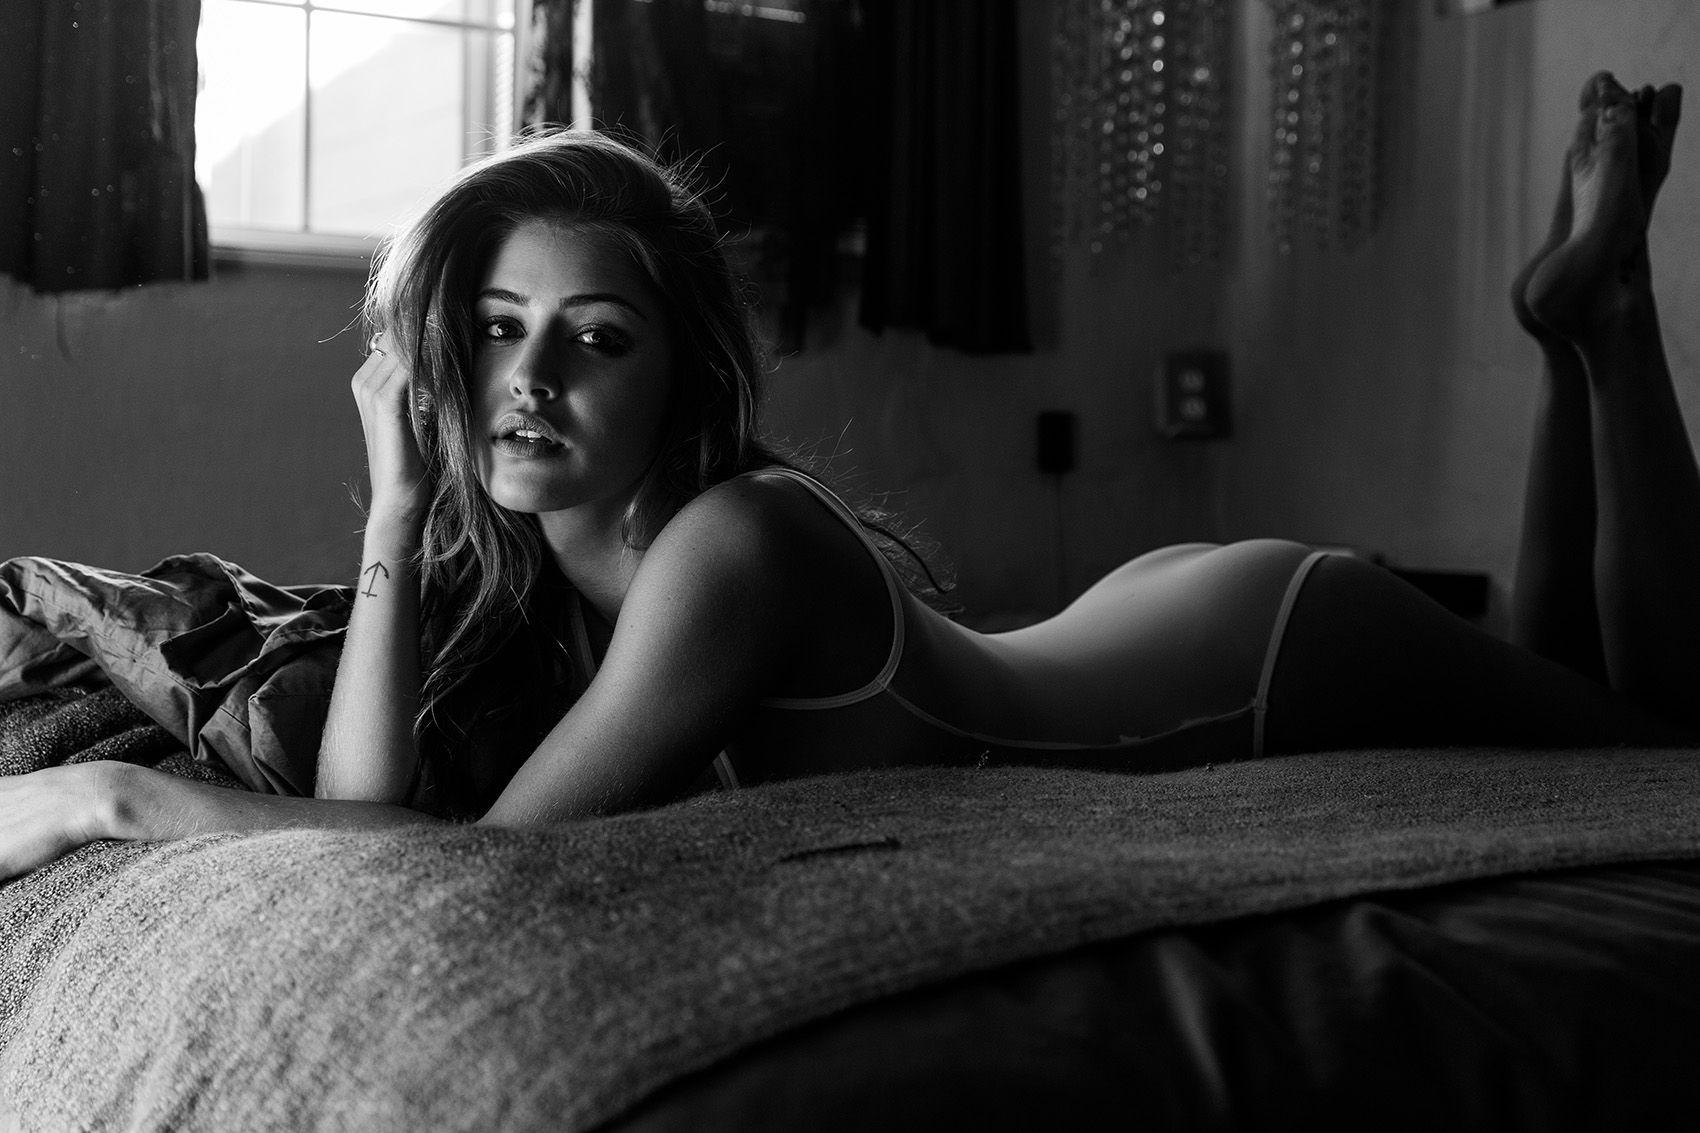 Hotel erotica rendevouz in paradise